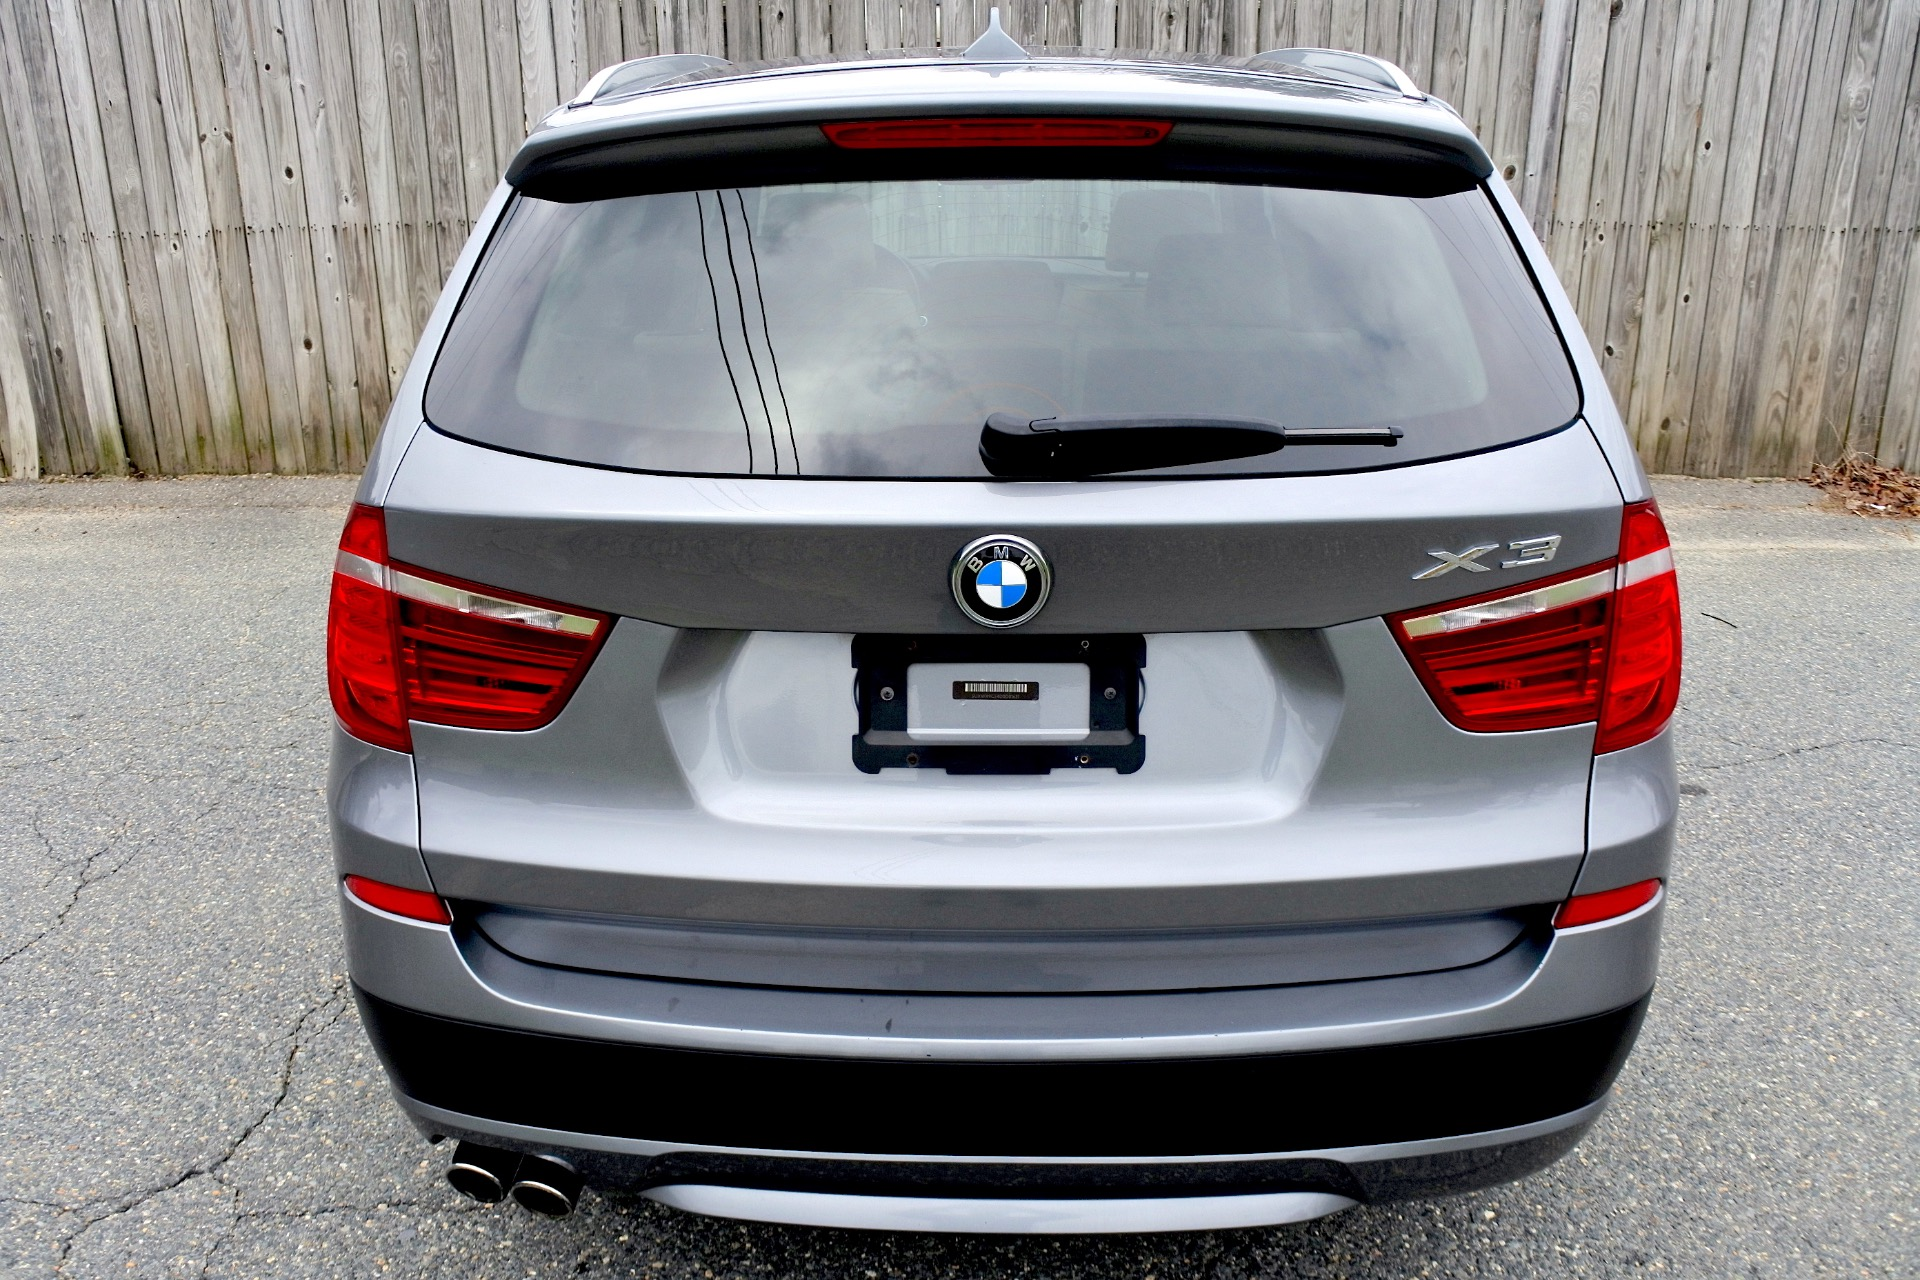 Used 2013 BMW X3 xDrive28i AWD Used 2013 BMW X3 xDrive28i AWD for sale  at Metro West Motorcars LLC in Shrewsbury MA 4